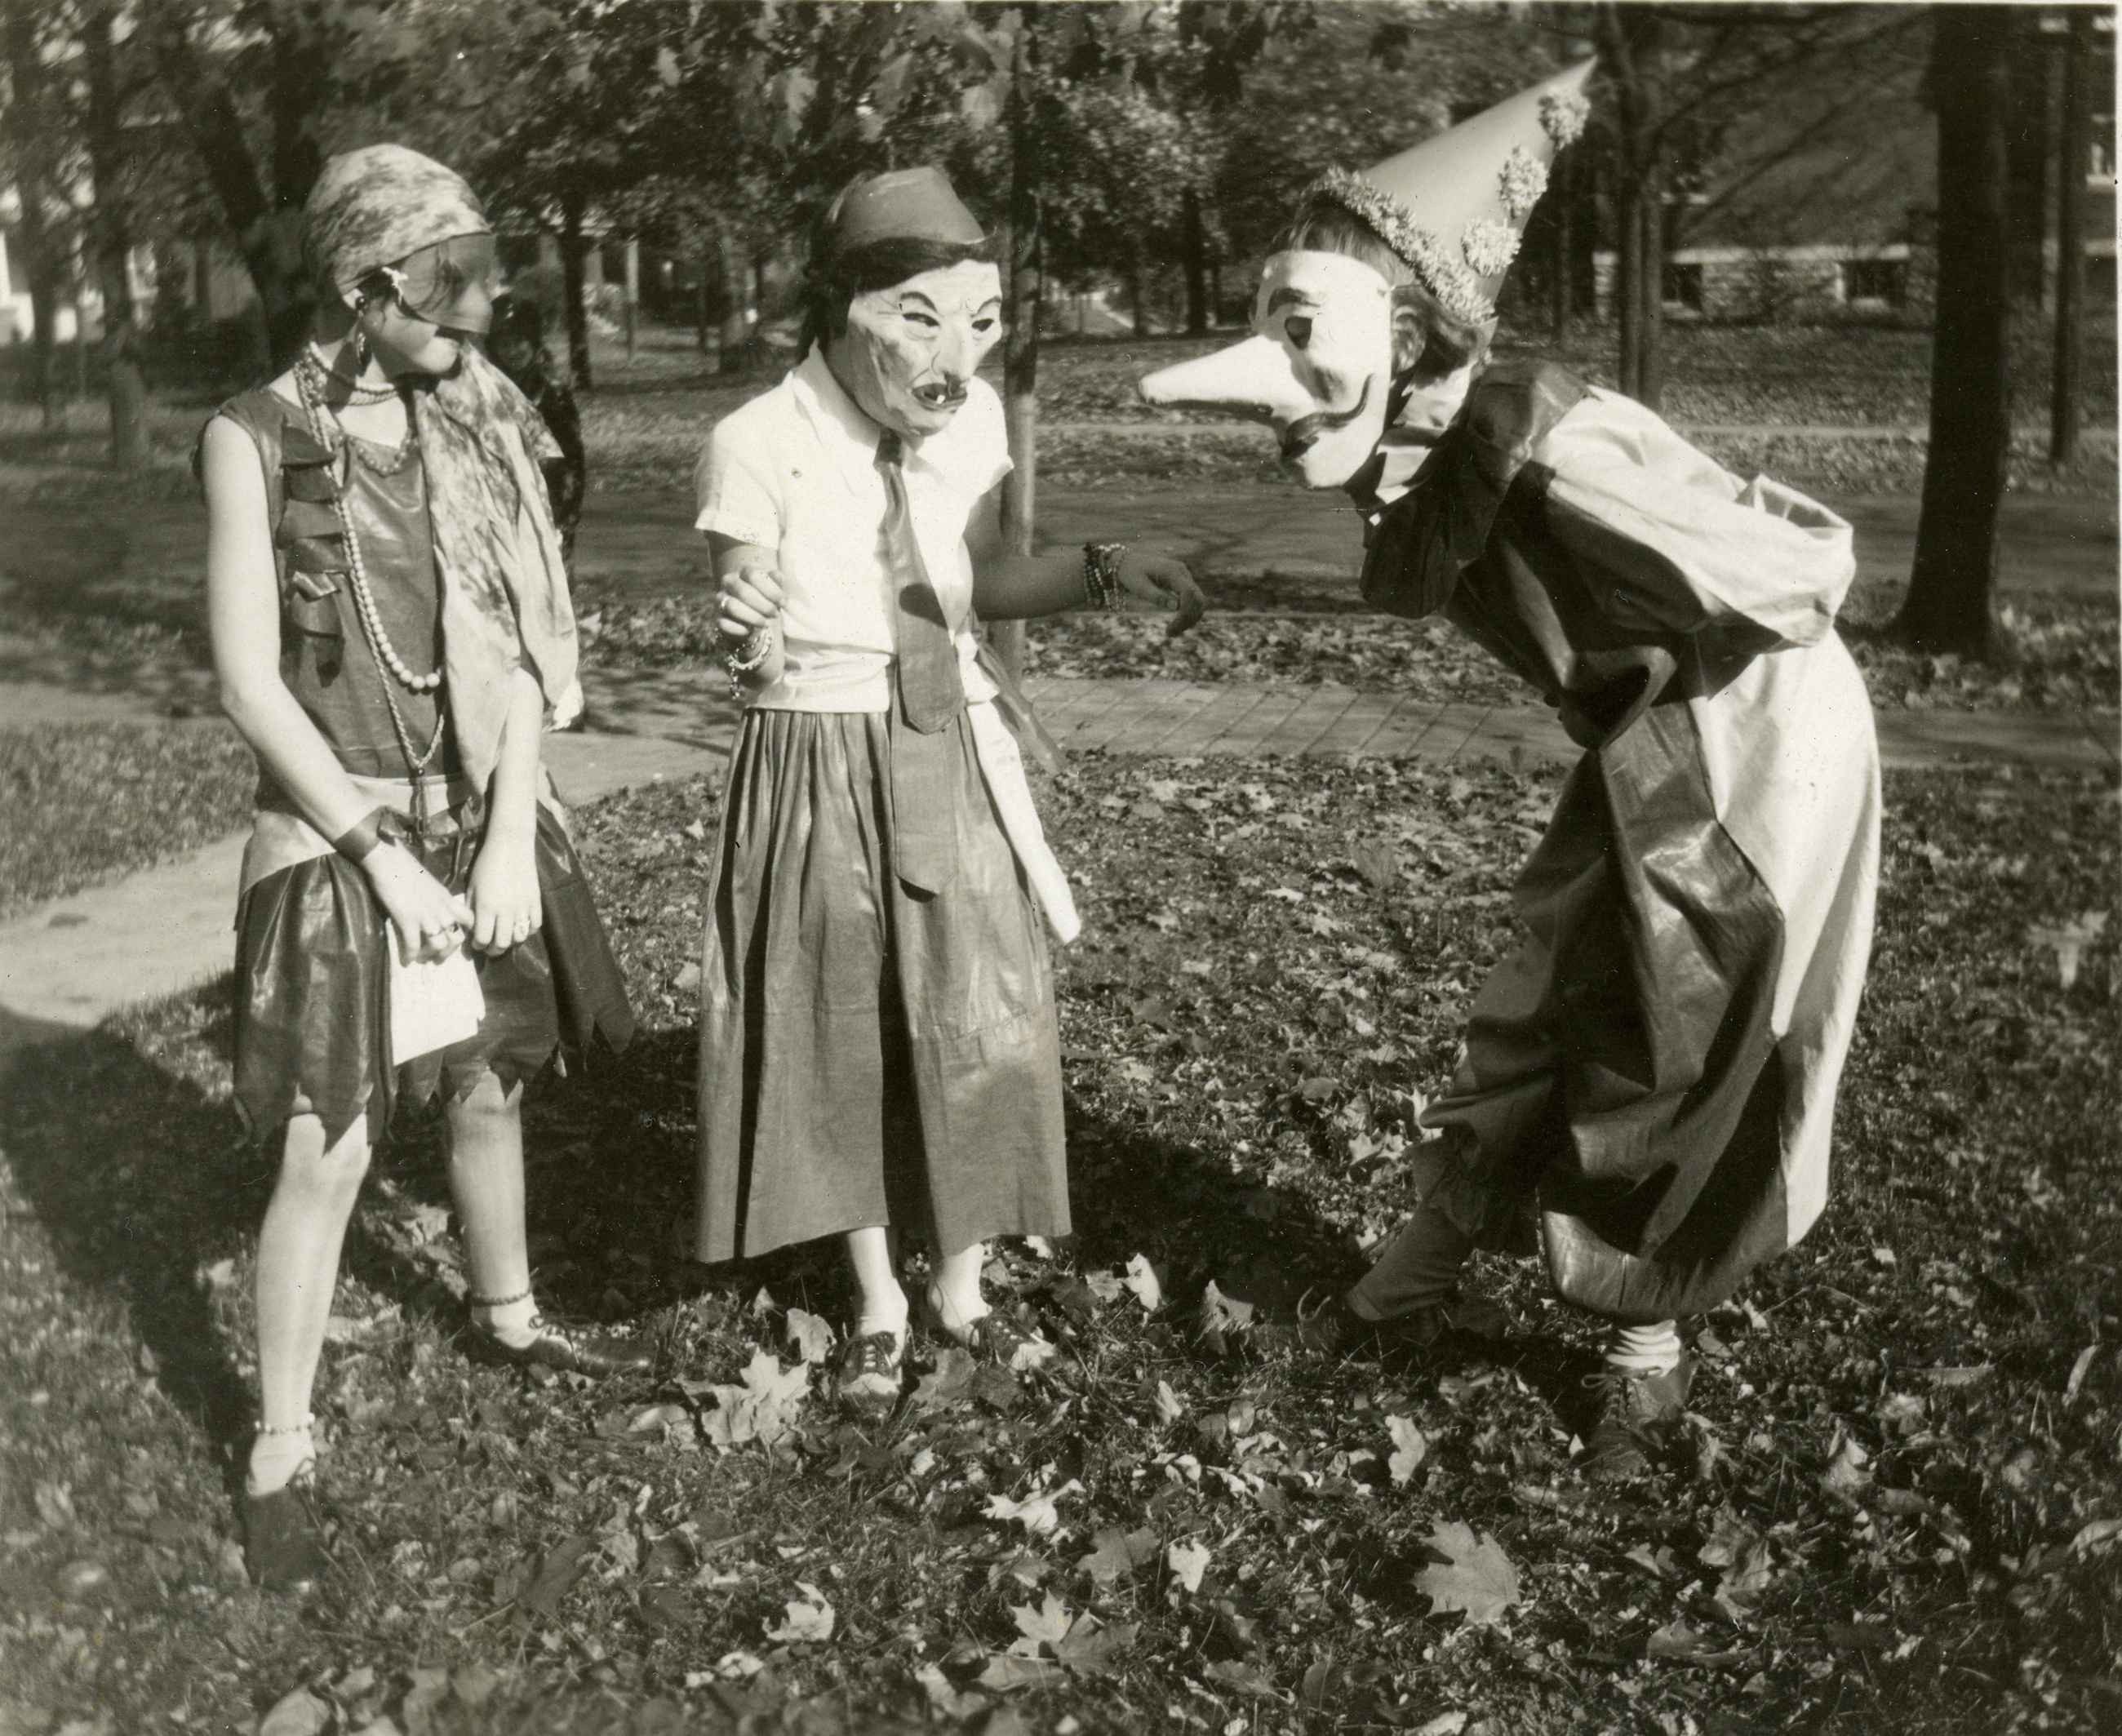 125 Years of Halloween Costumes - Vintage Halloween Costumes